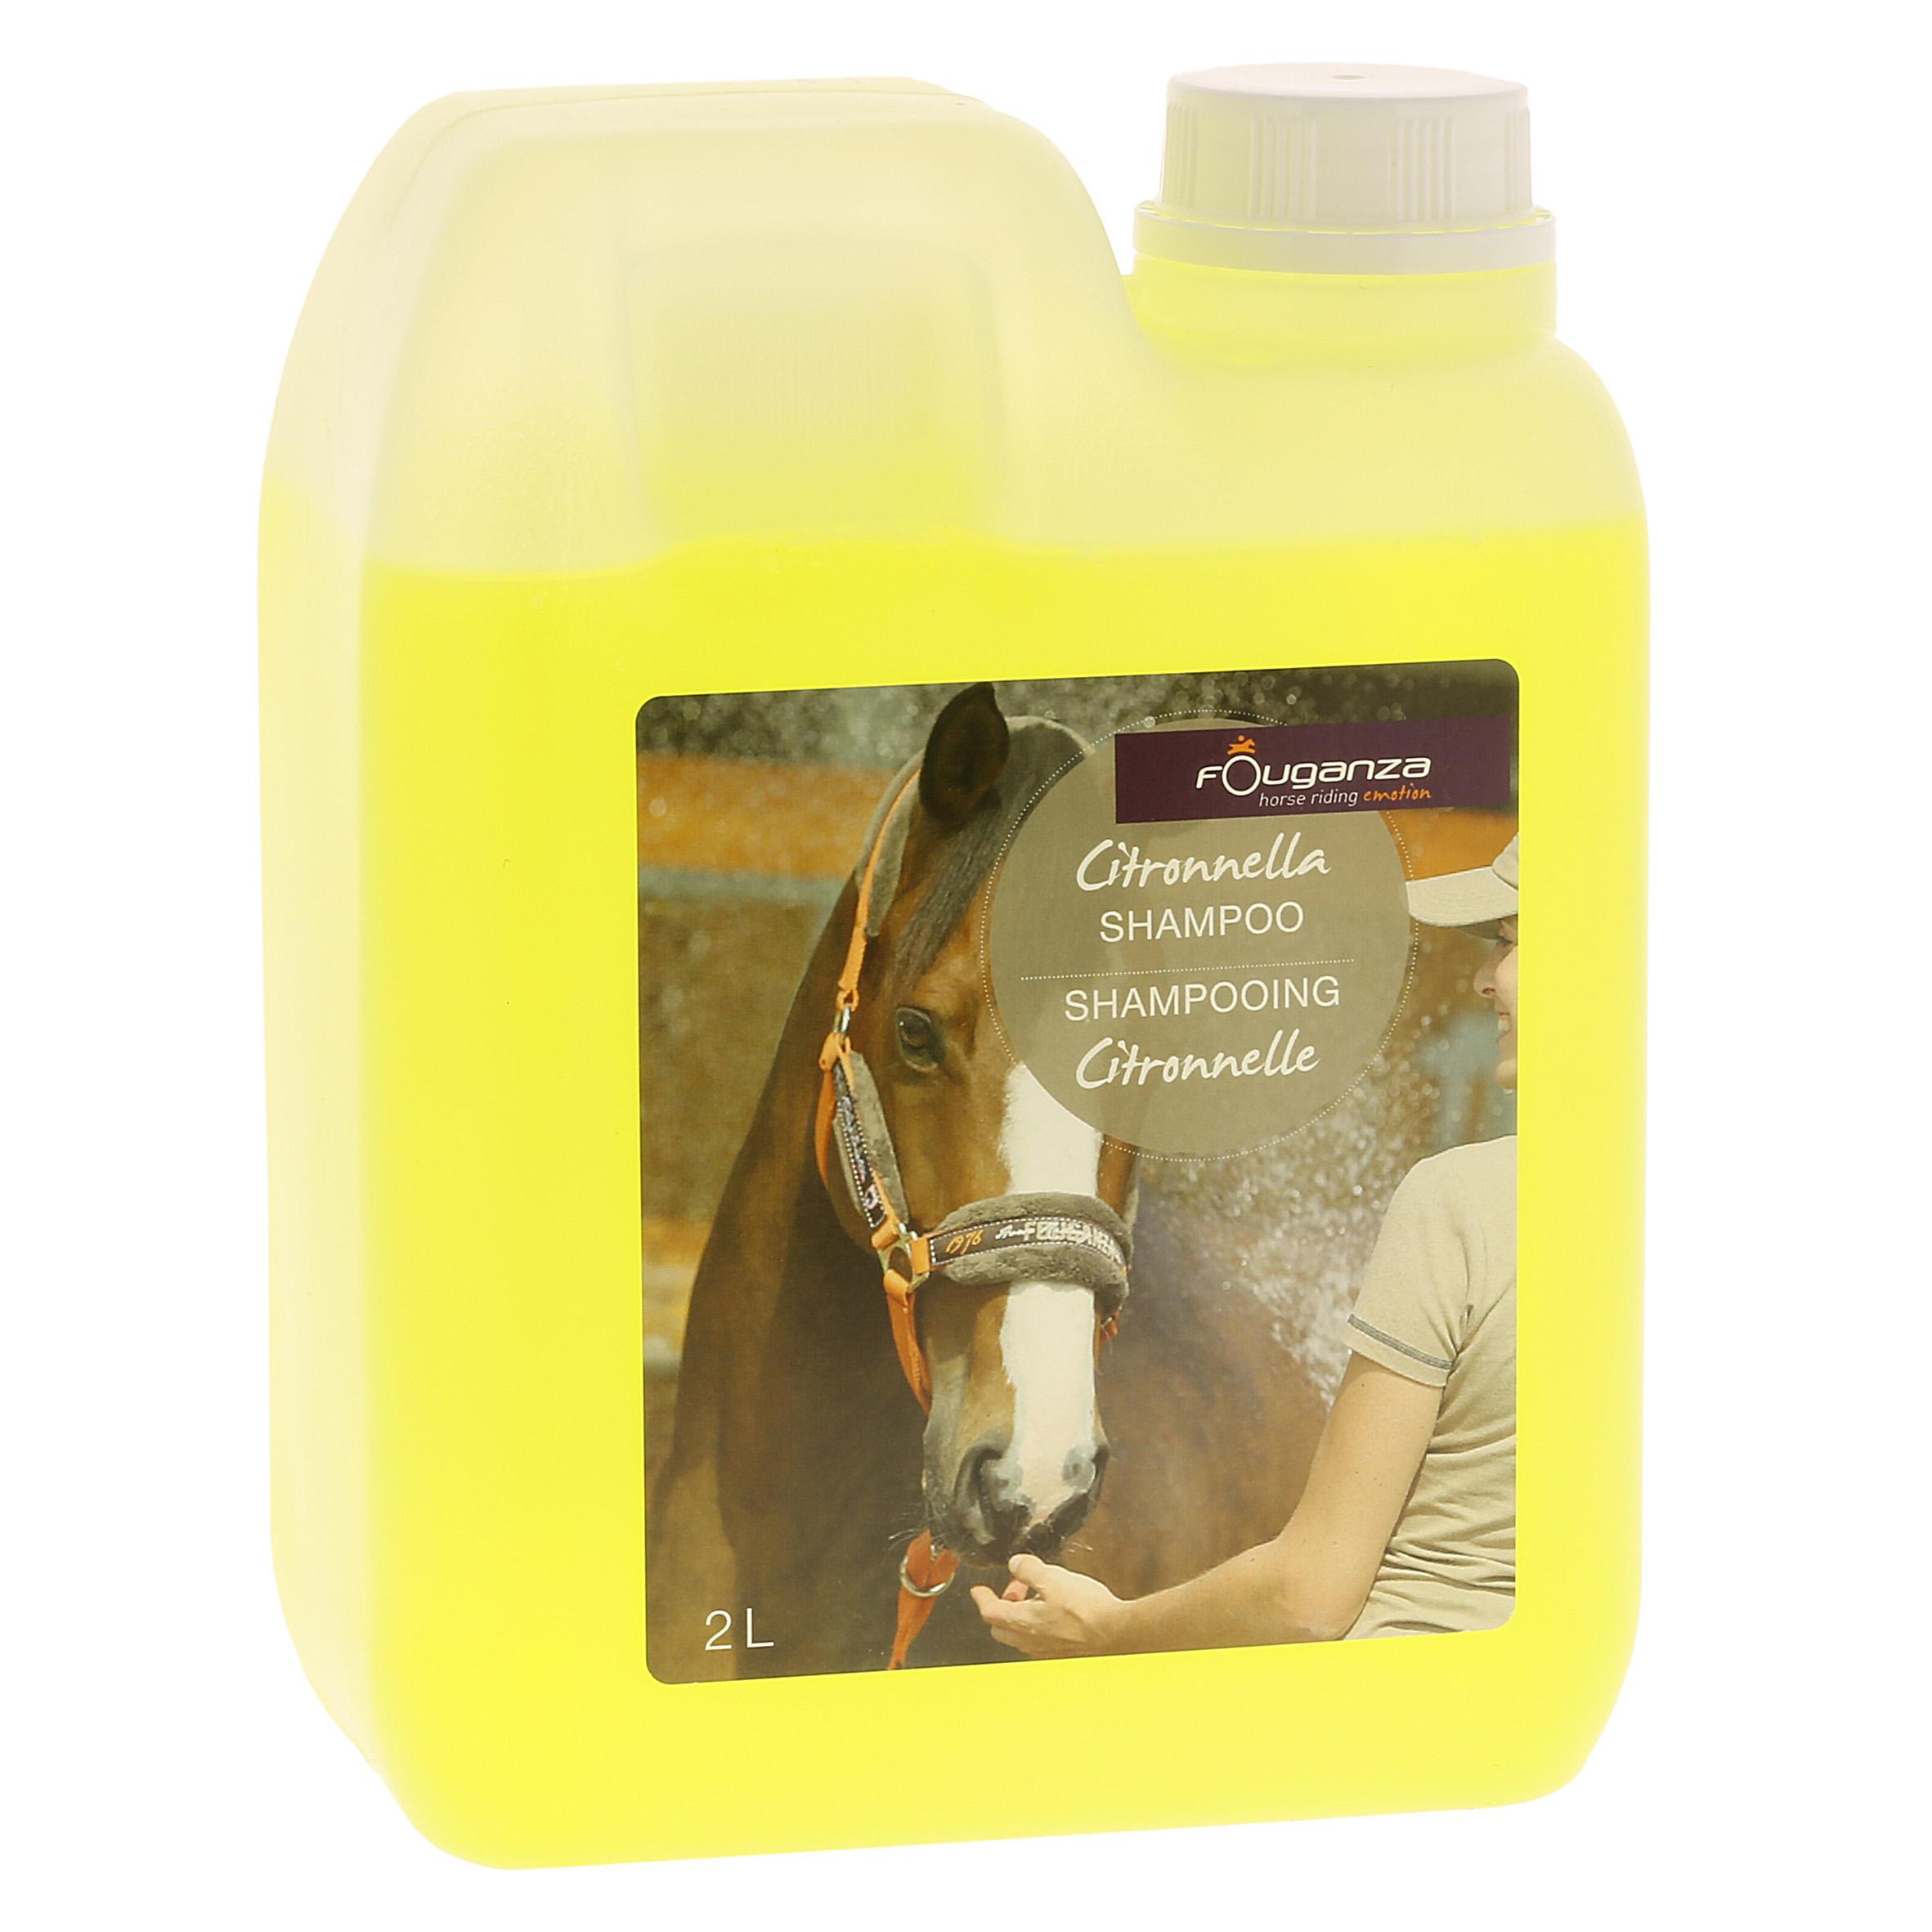 Fouganza Ontwarrende shampoo Citronella ruitersport paarden en pony's - 500 ml